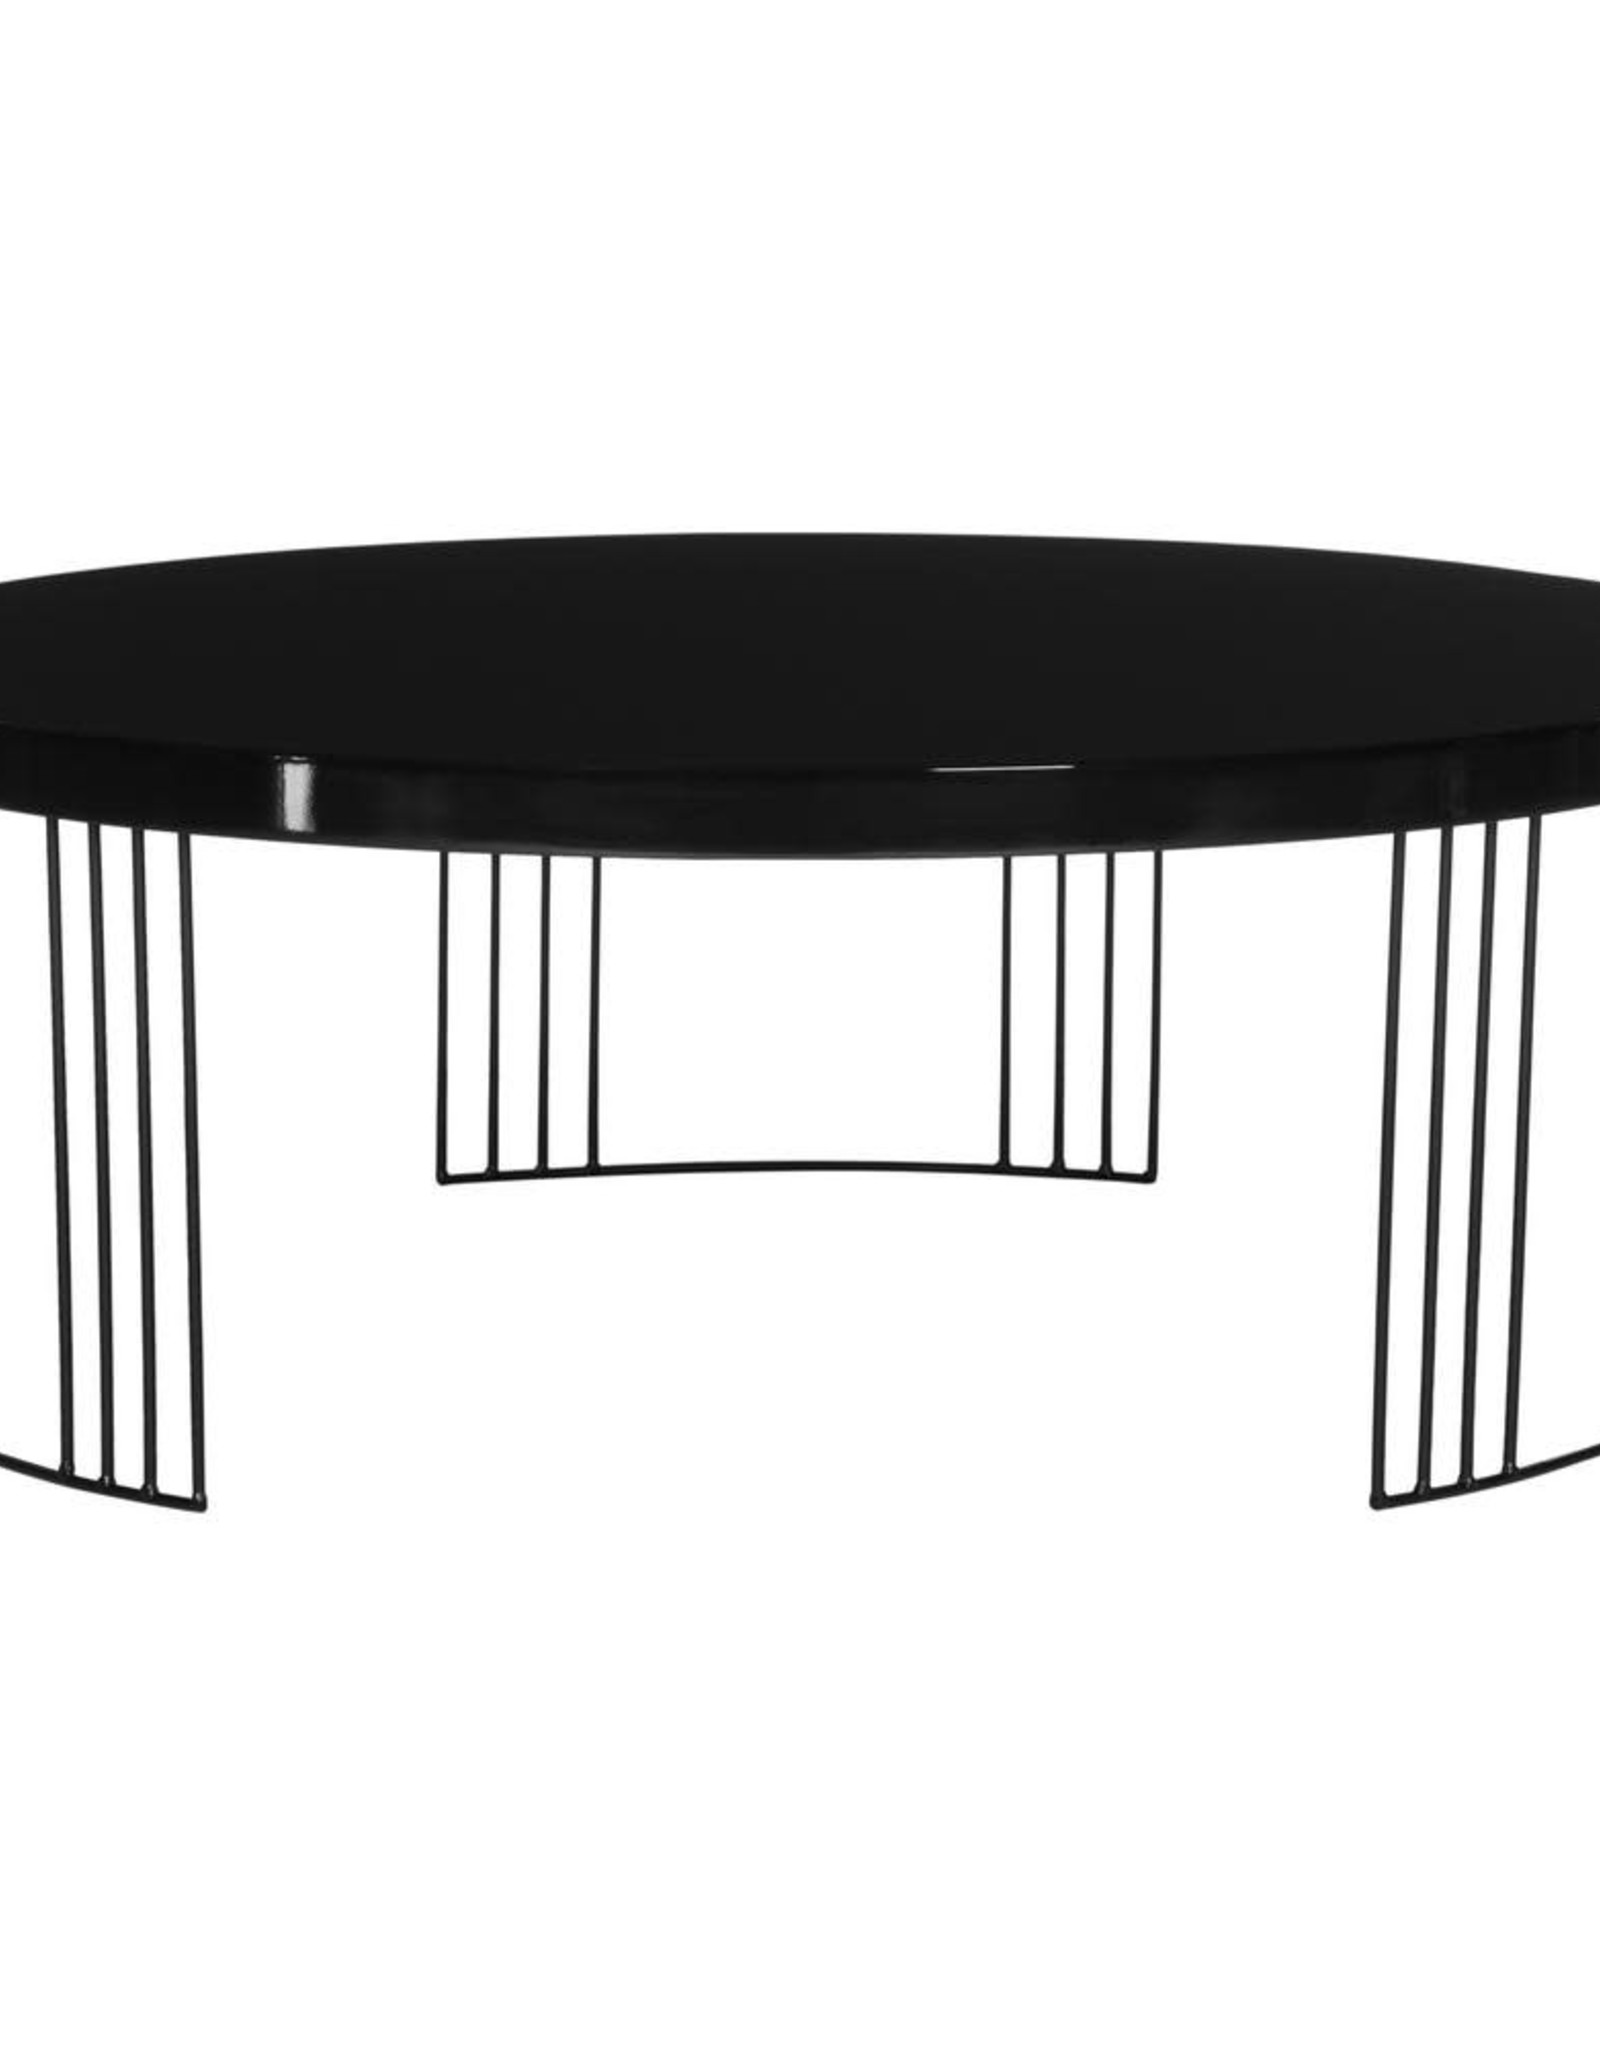 Keelin Mid Century Scandinavian Lacquer Black Coffee Table